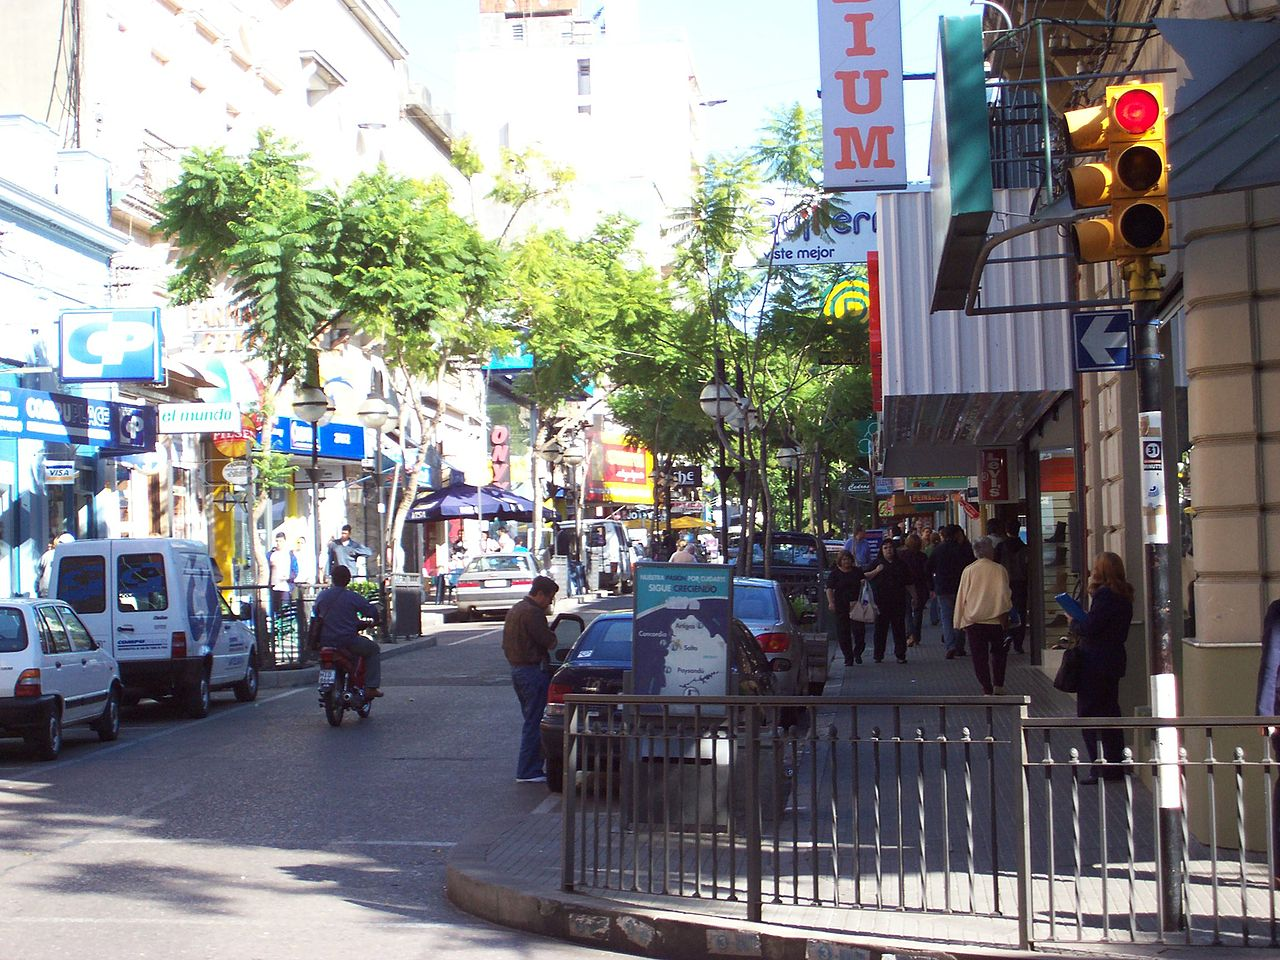 Filming locations Uruguay - Salto